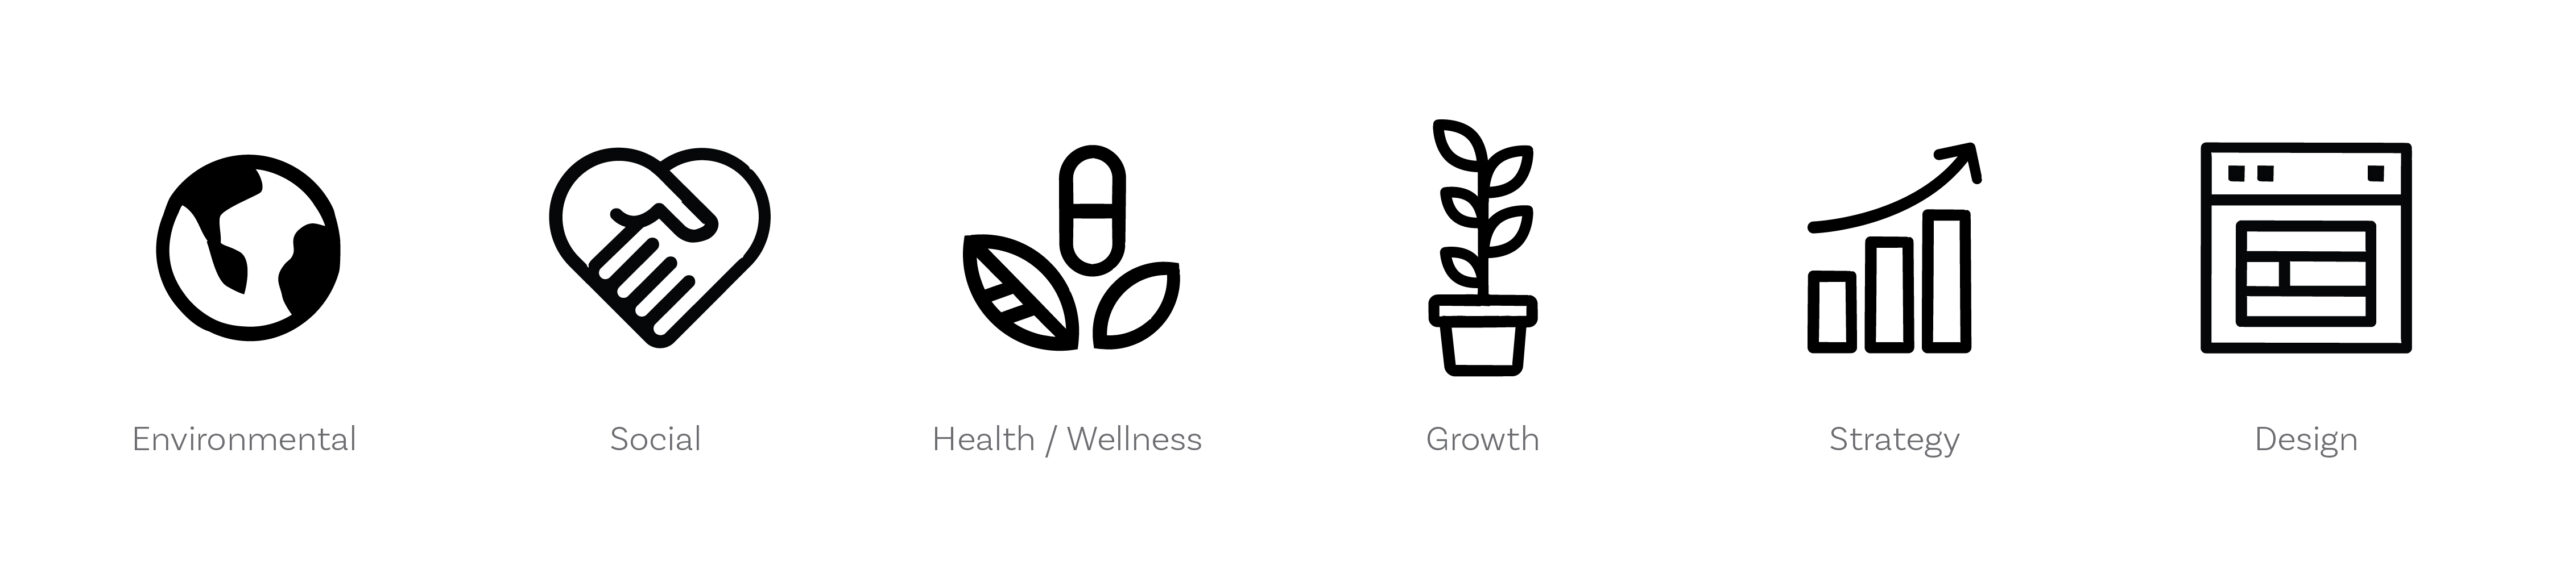 Human_Branding_By_Stellen_Design_Icons